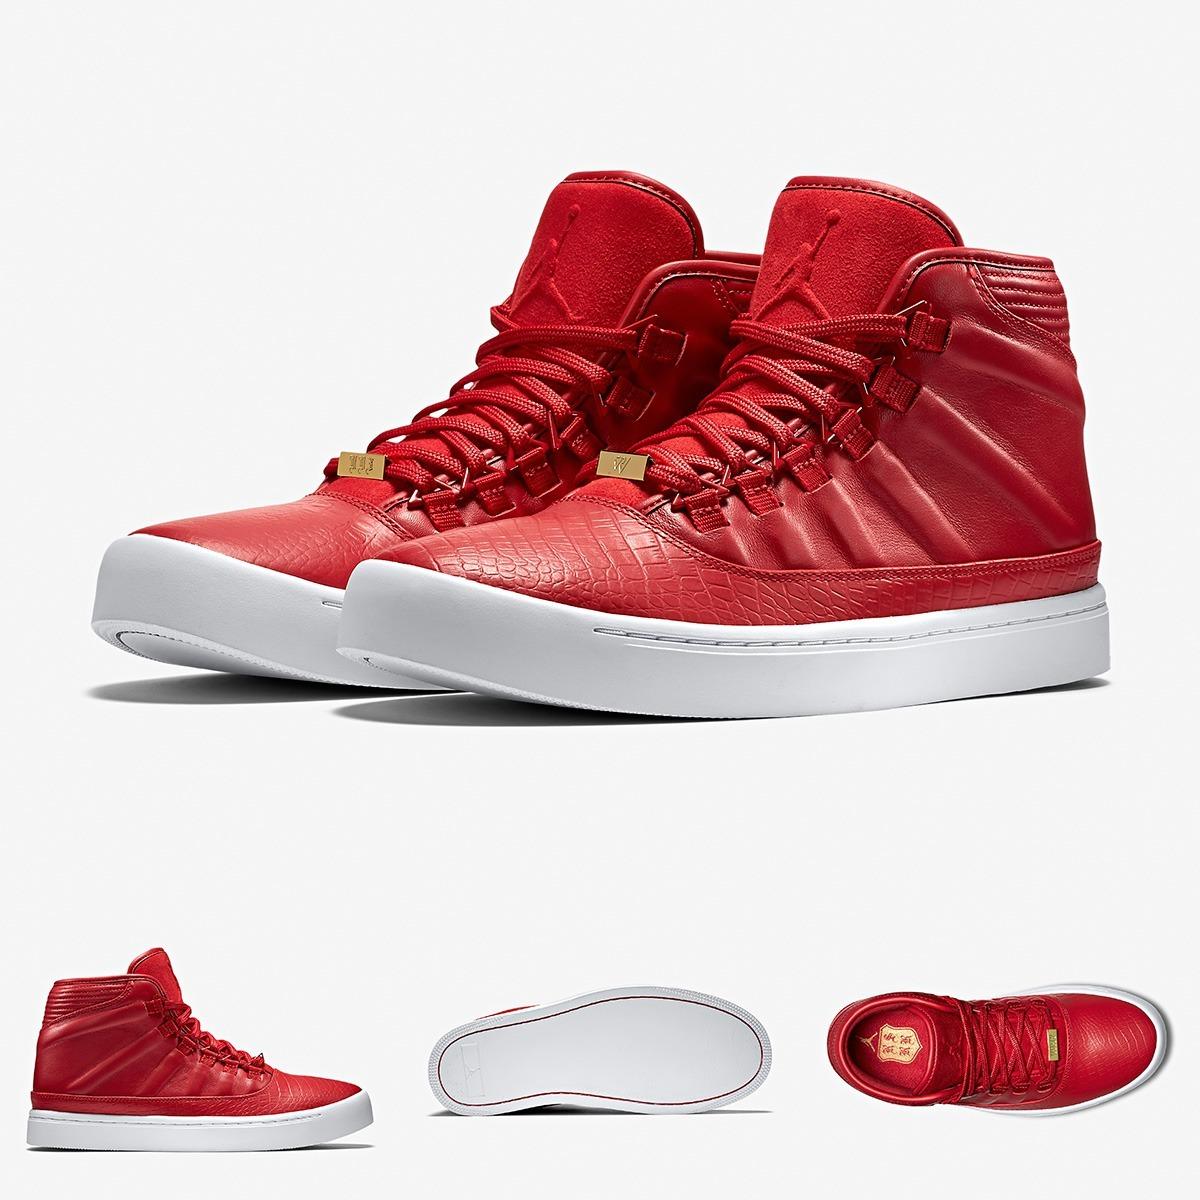 new product 4b4e0 773b0 zapatillas nike air jordan westbrook 0 red botines original. Cargando zoom.